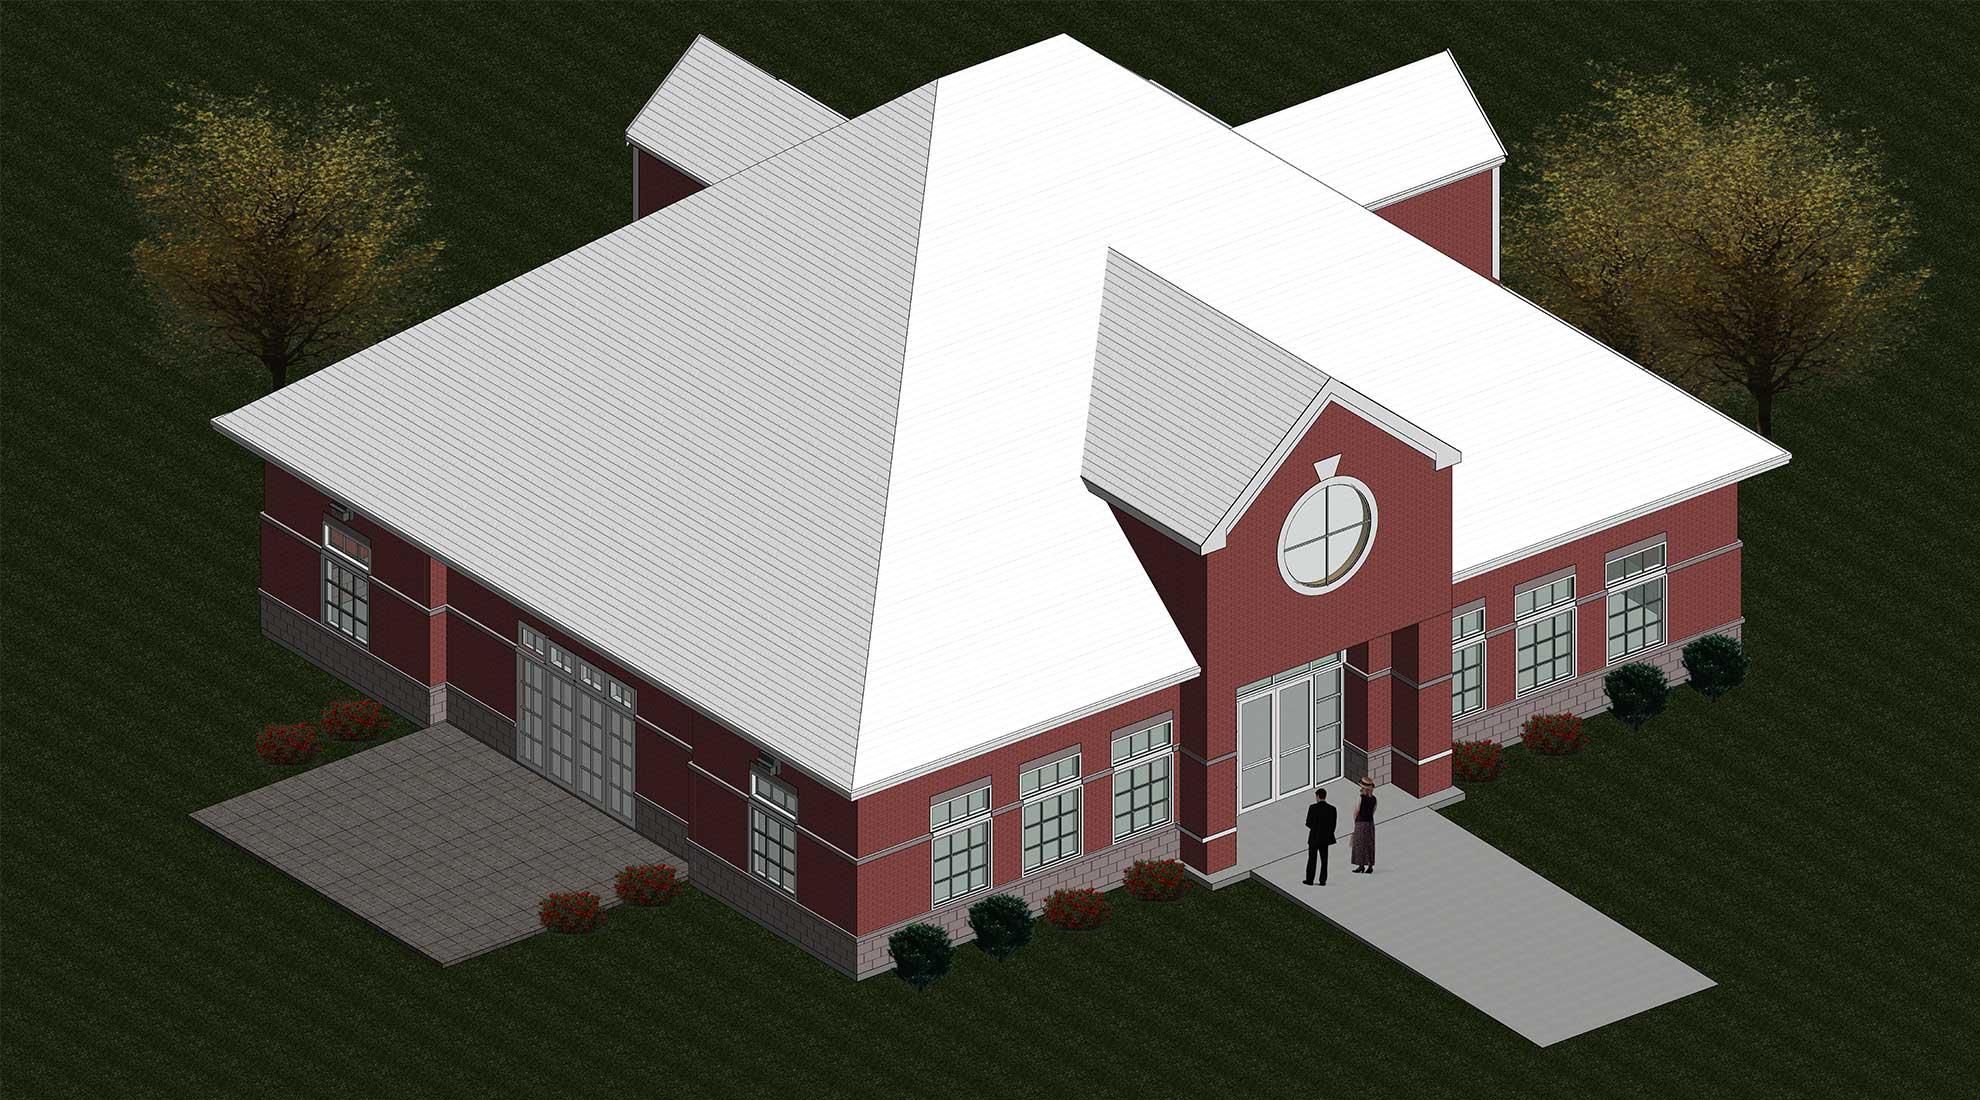 3D-Architectural-BIM-Model-Revit-Modeling-by-United-BIM